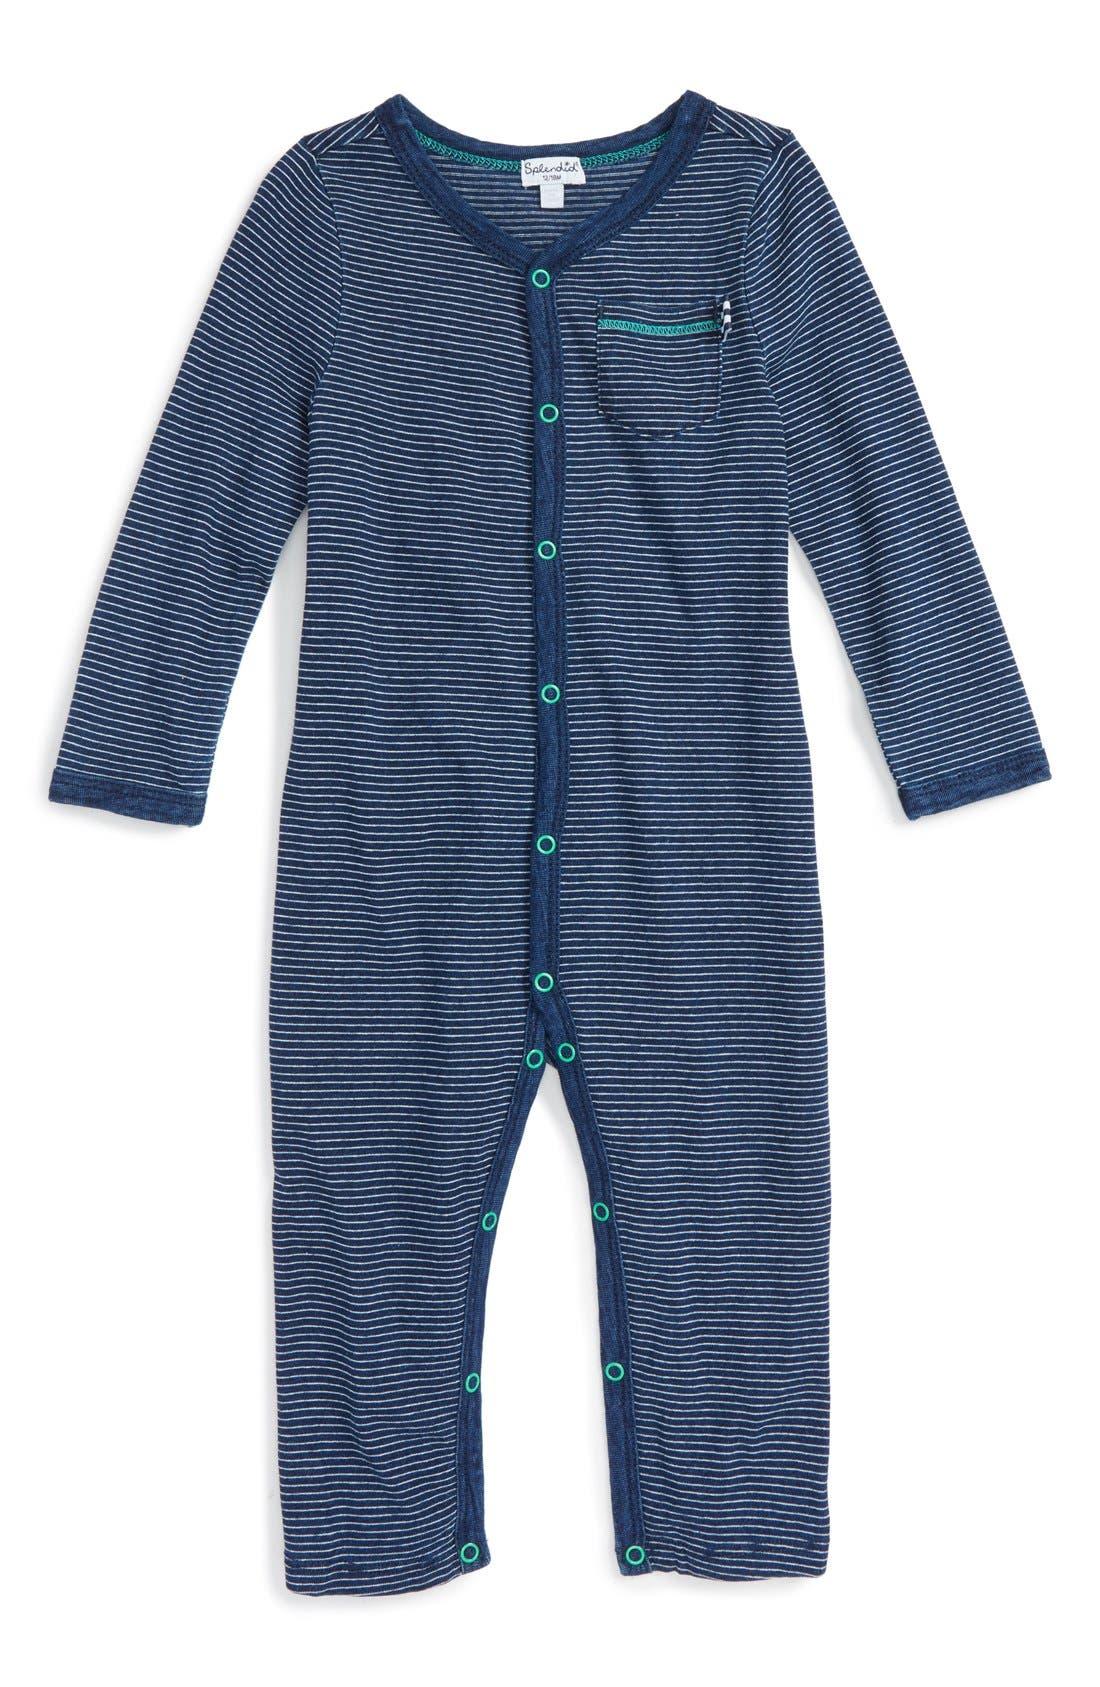 Splendid Stripe Cotton Romper (Baby Boys)